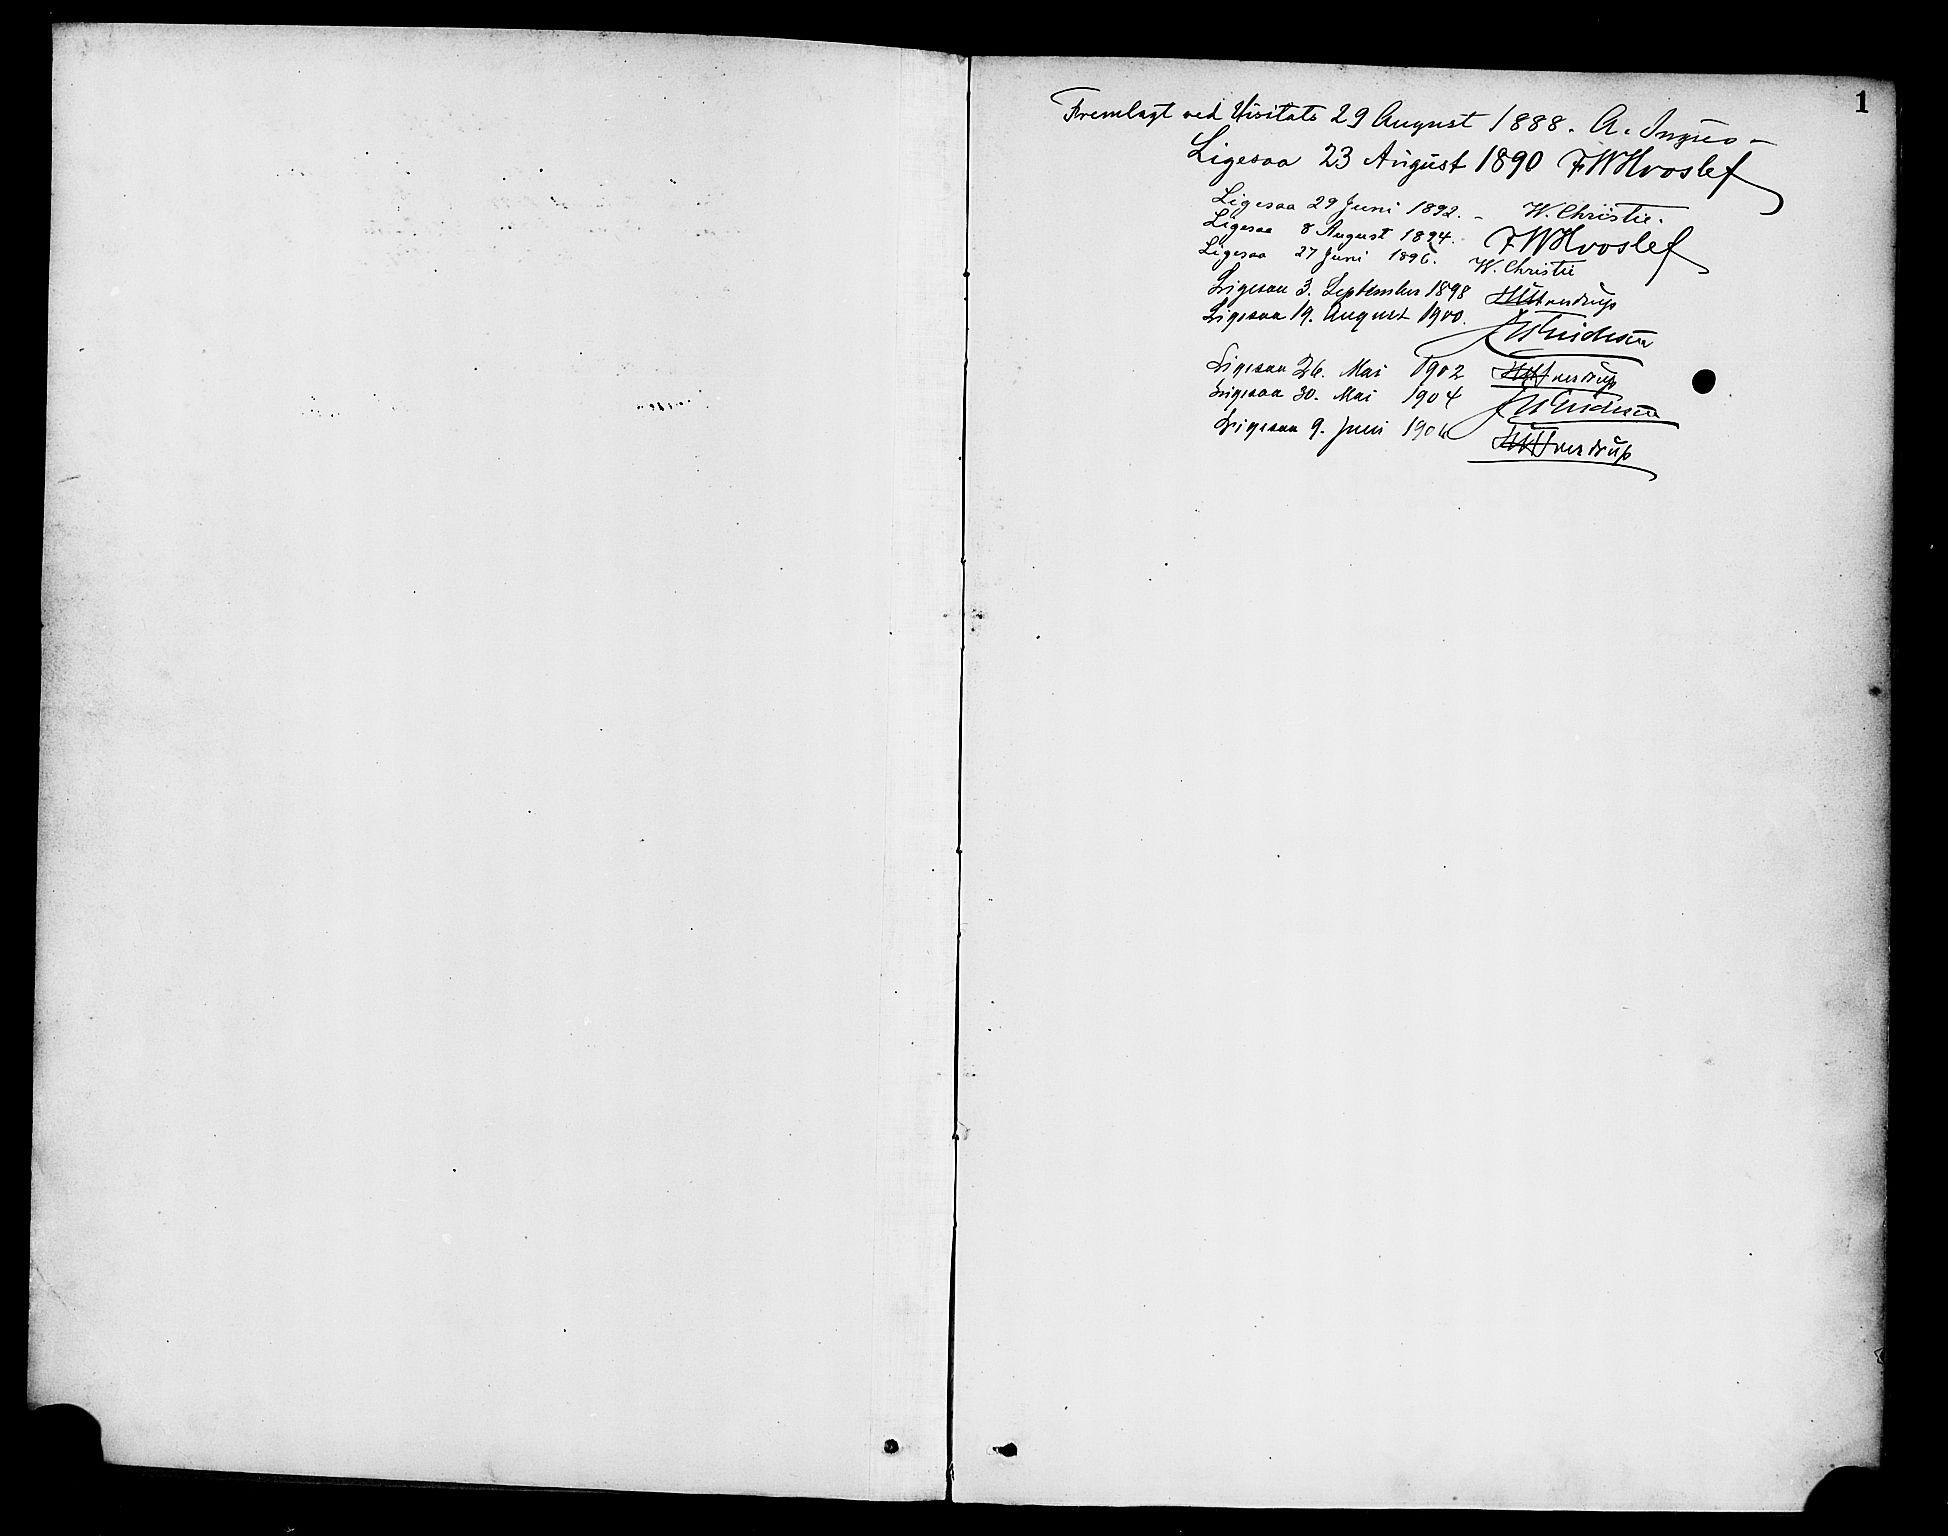 SAB, Hyllestad Sokneprestembete, Ministerialbok nr. C 1, 1886-1904, s. 1